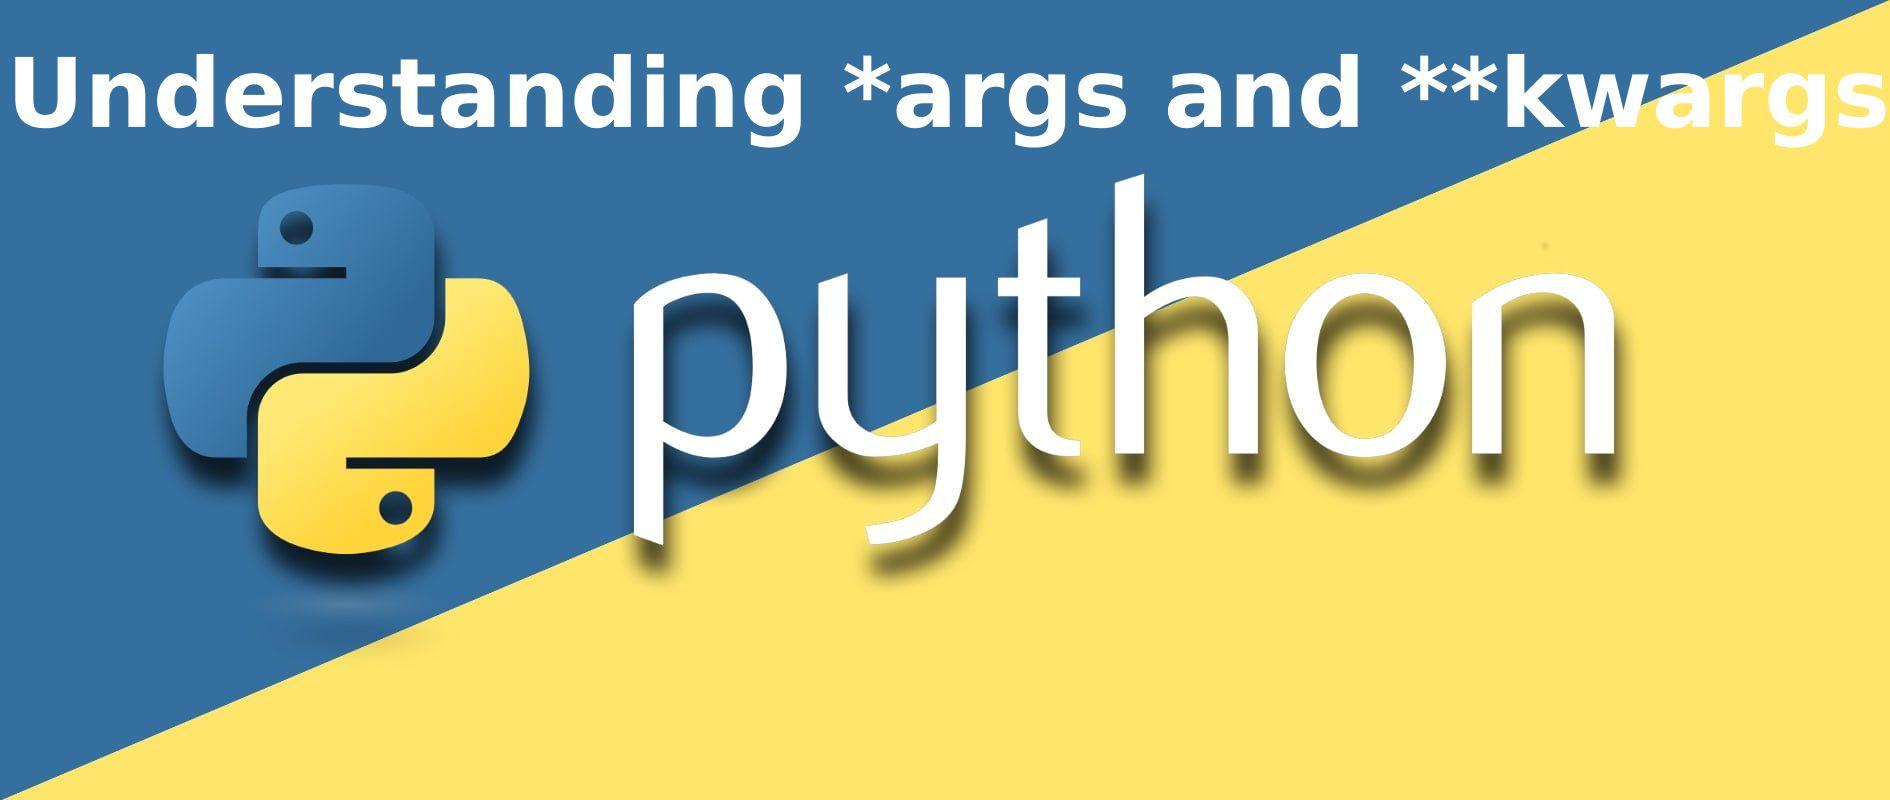 Understanding *args and **kwargs